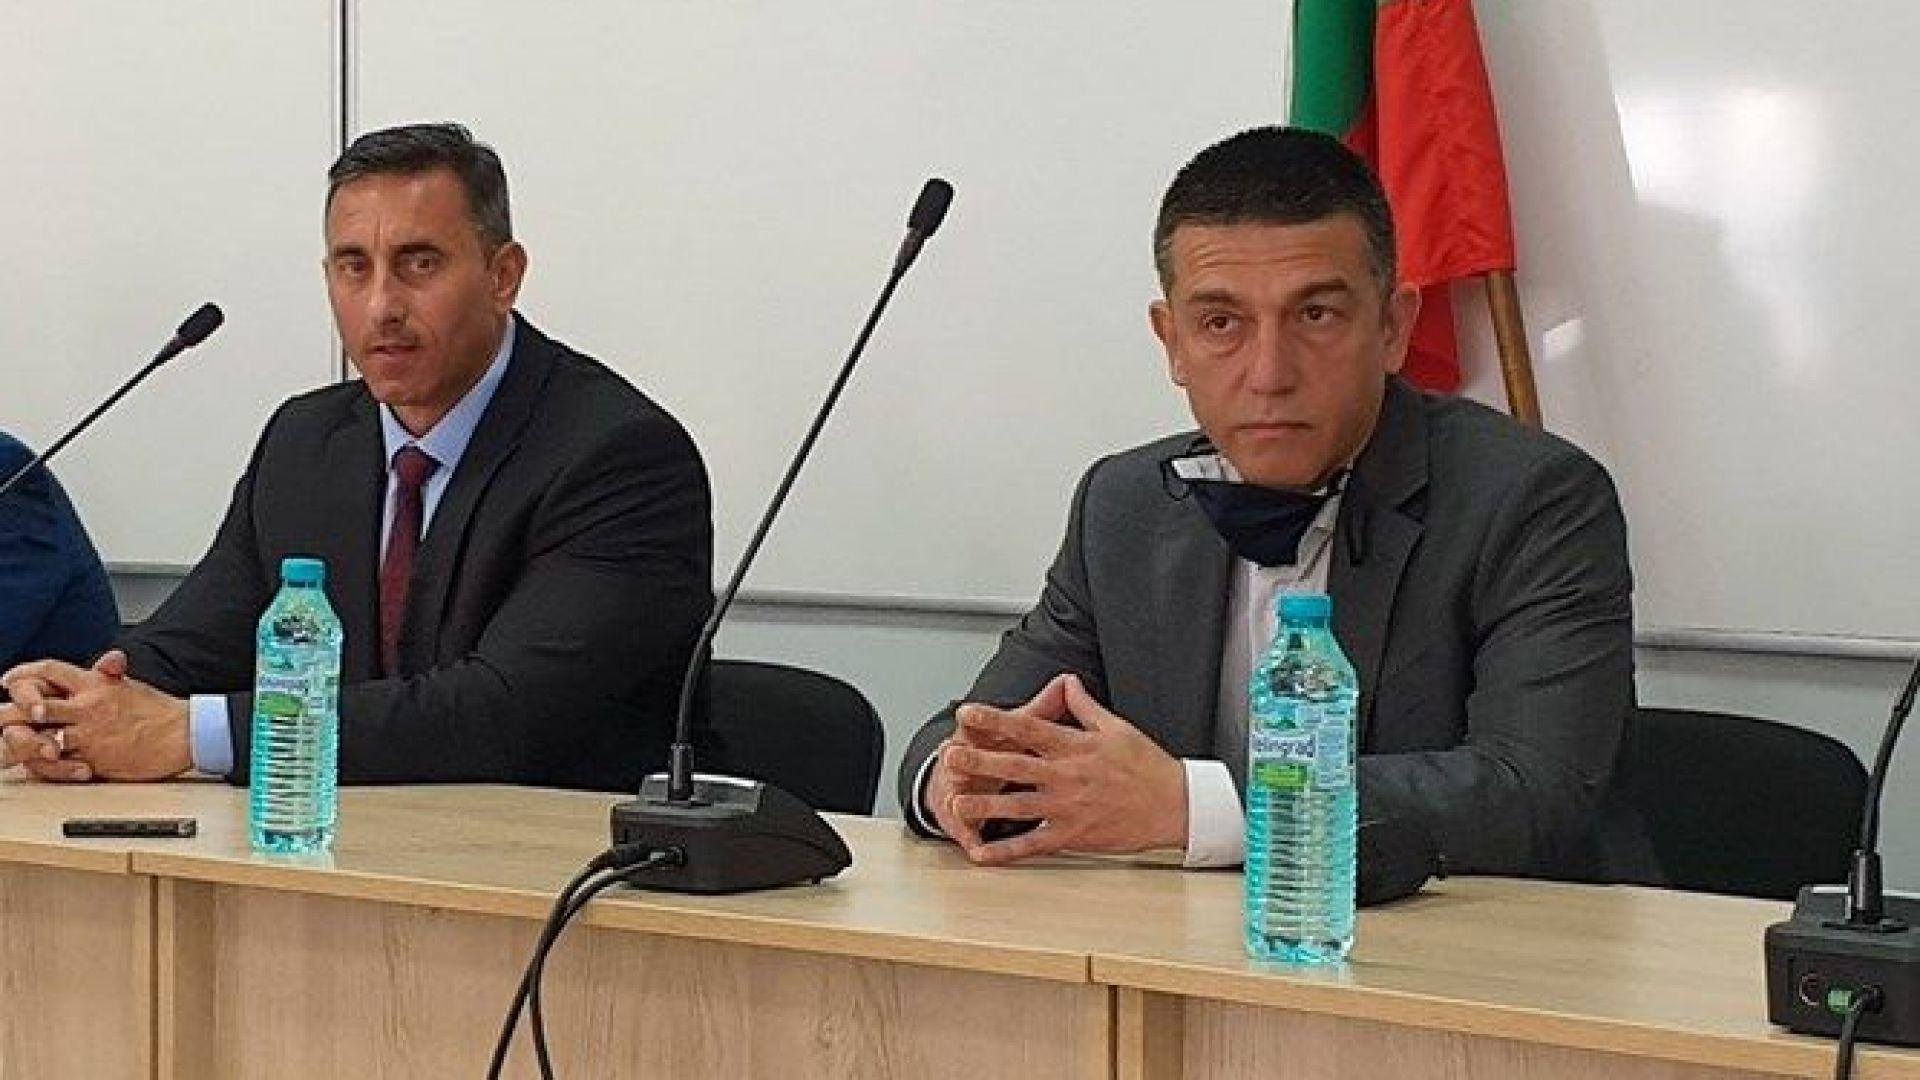 Георги Димов е новият зам.-шеф на НАП